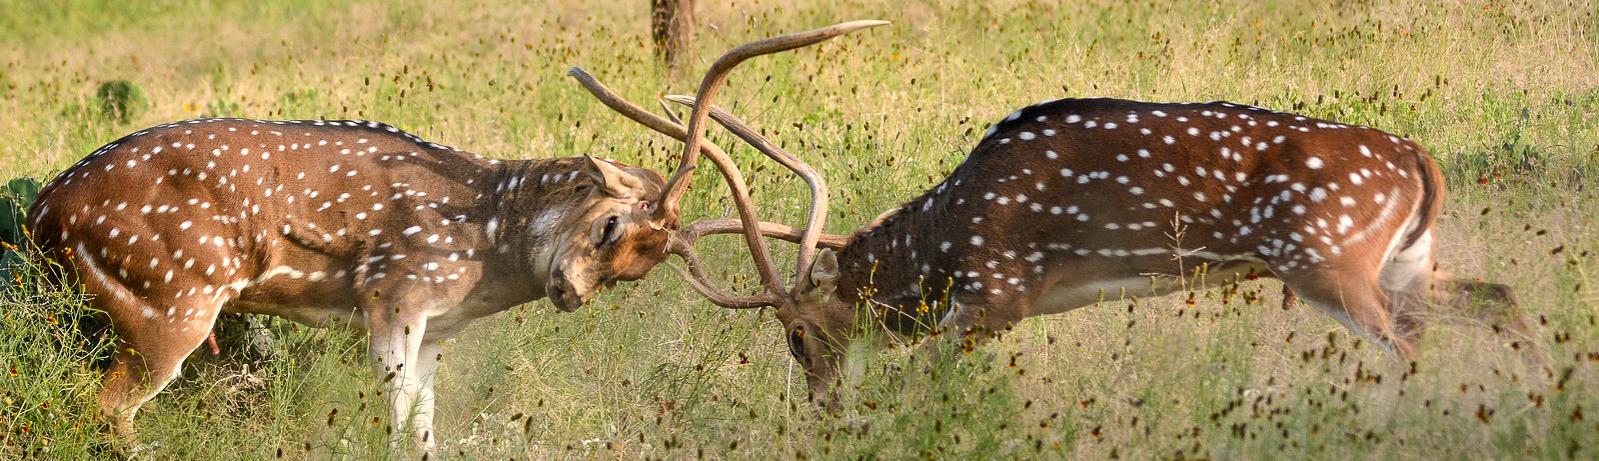 2 Axis bucks fighting